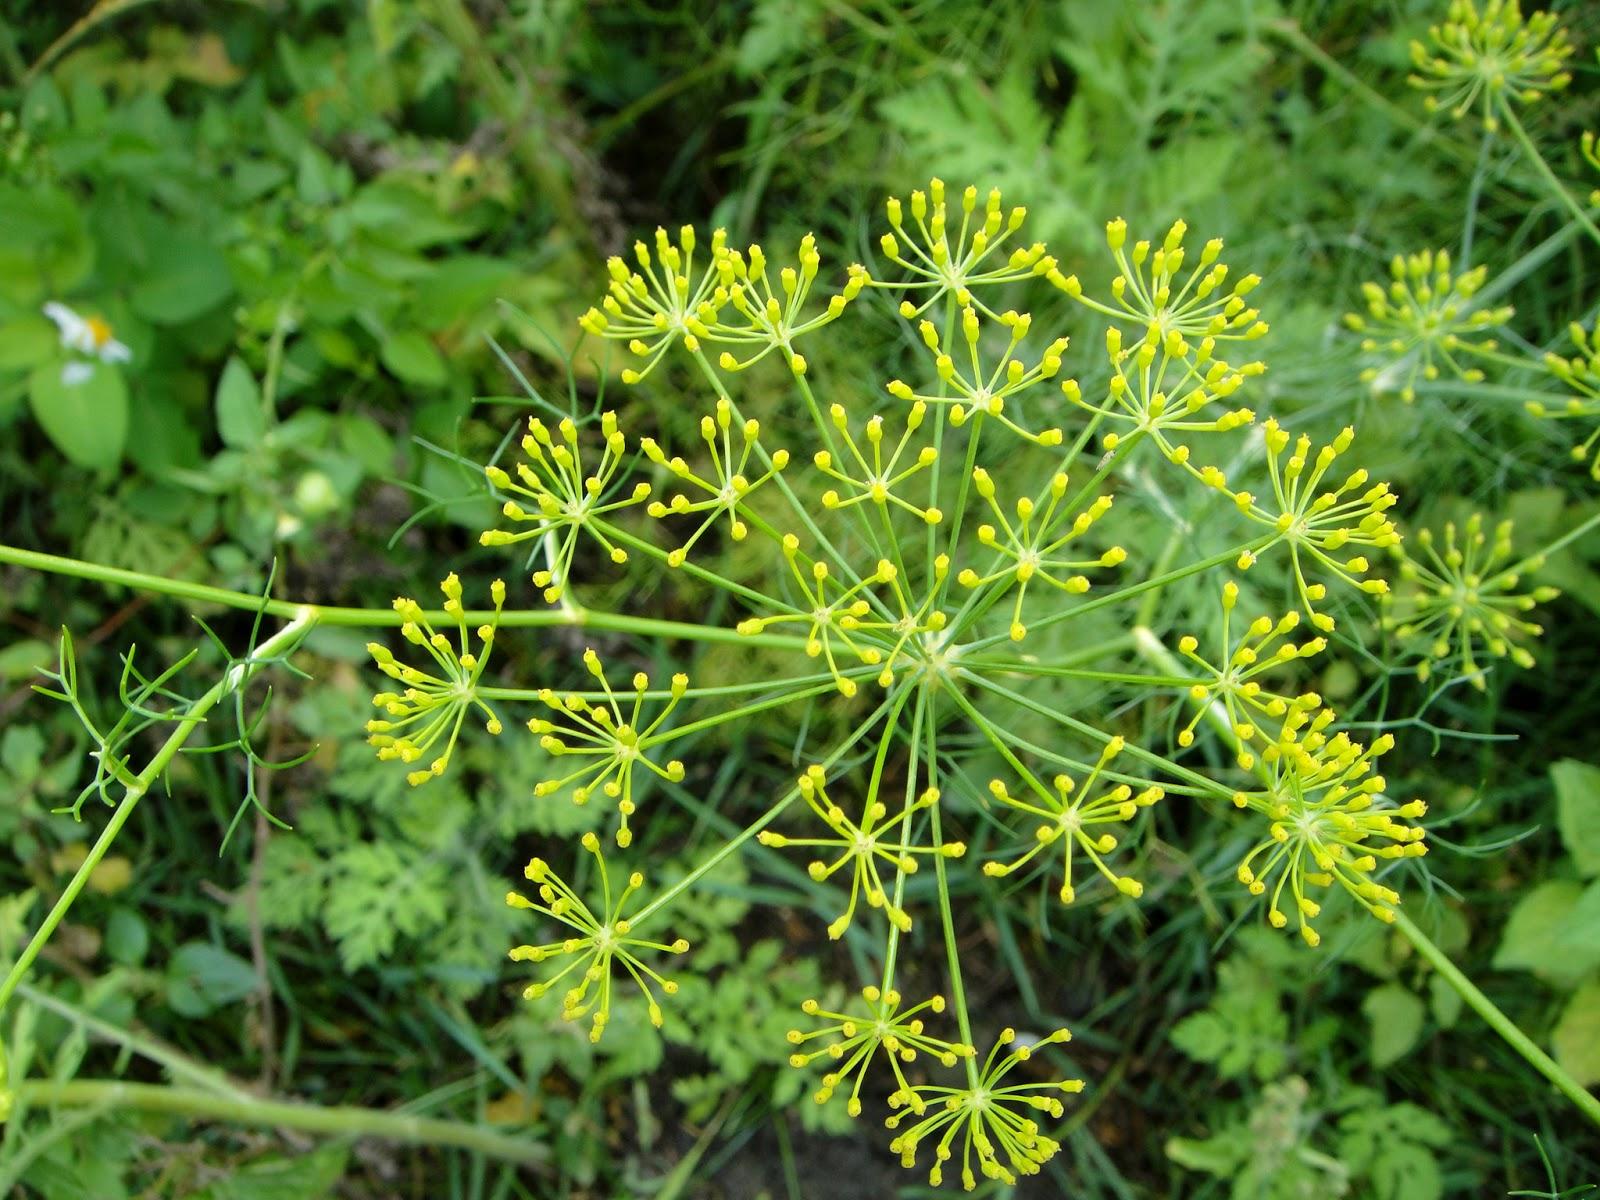 DWAN雲之端: 茴香--屬繖形科植物;學名:Foeniculum vulgare Caertn。英文名:Fennel;別稱:懷香、小茴香、土小茴 ...